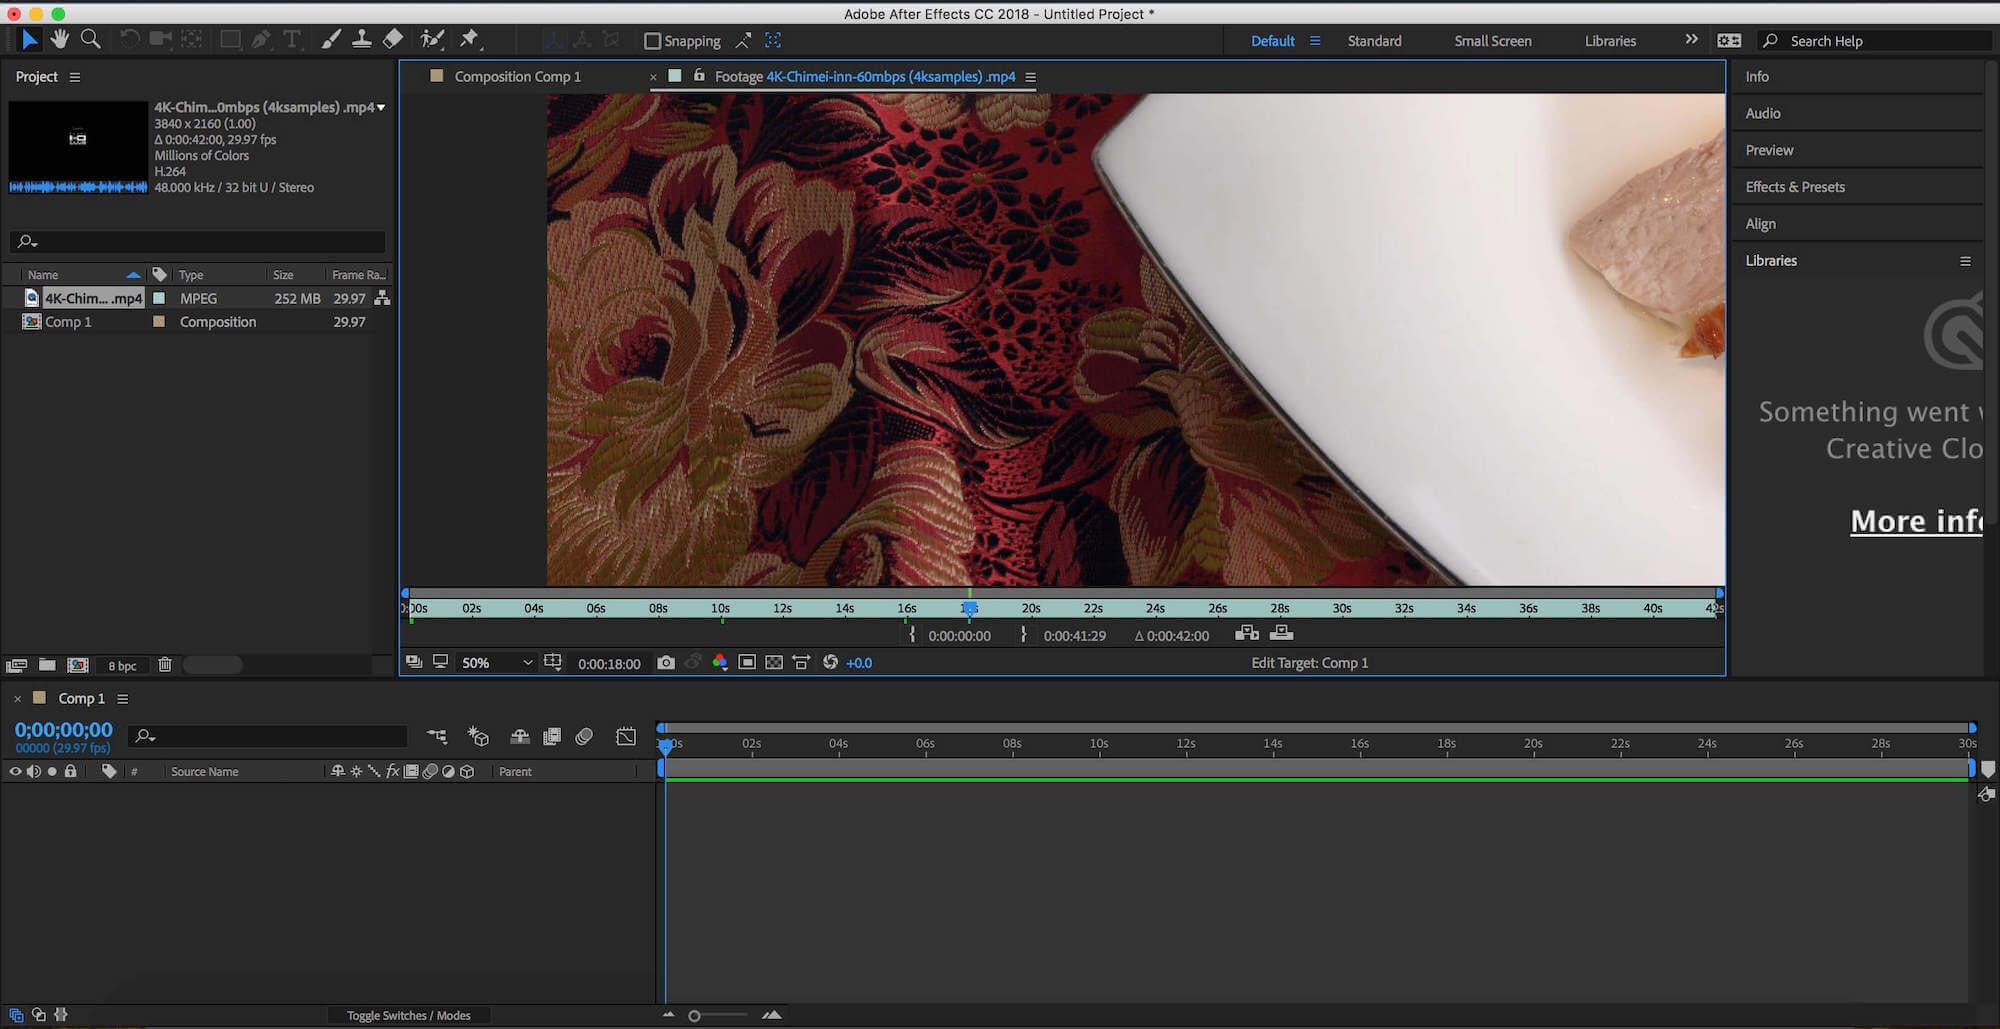 Adobe After Effects 2020 for Mac v17.1.2 中文和谐版下载 AE视频处理软件 Adobe系列 第2张